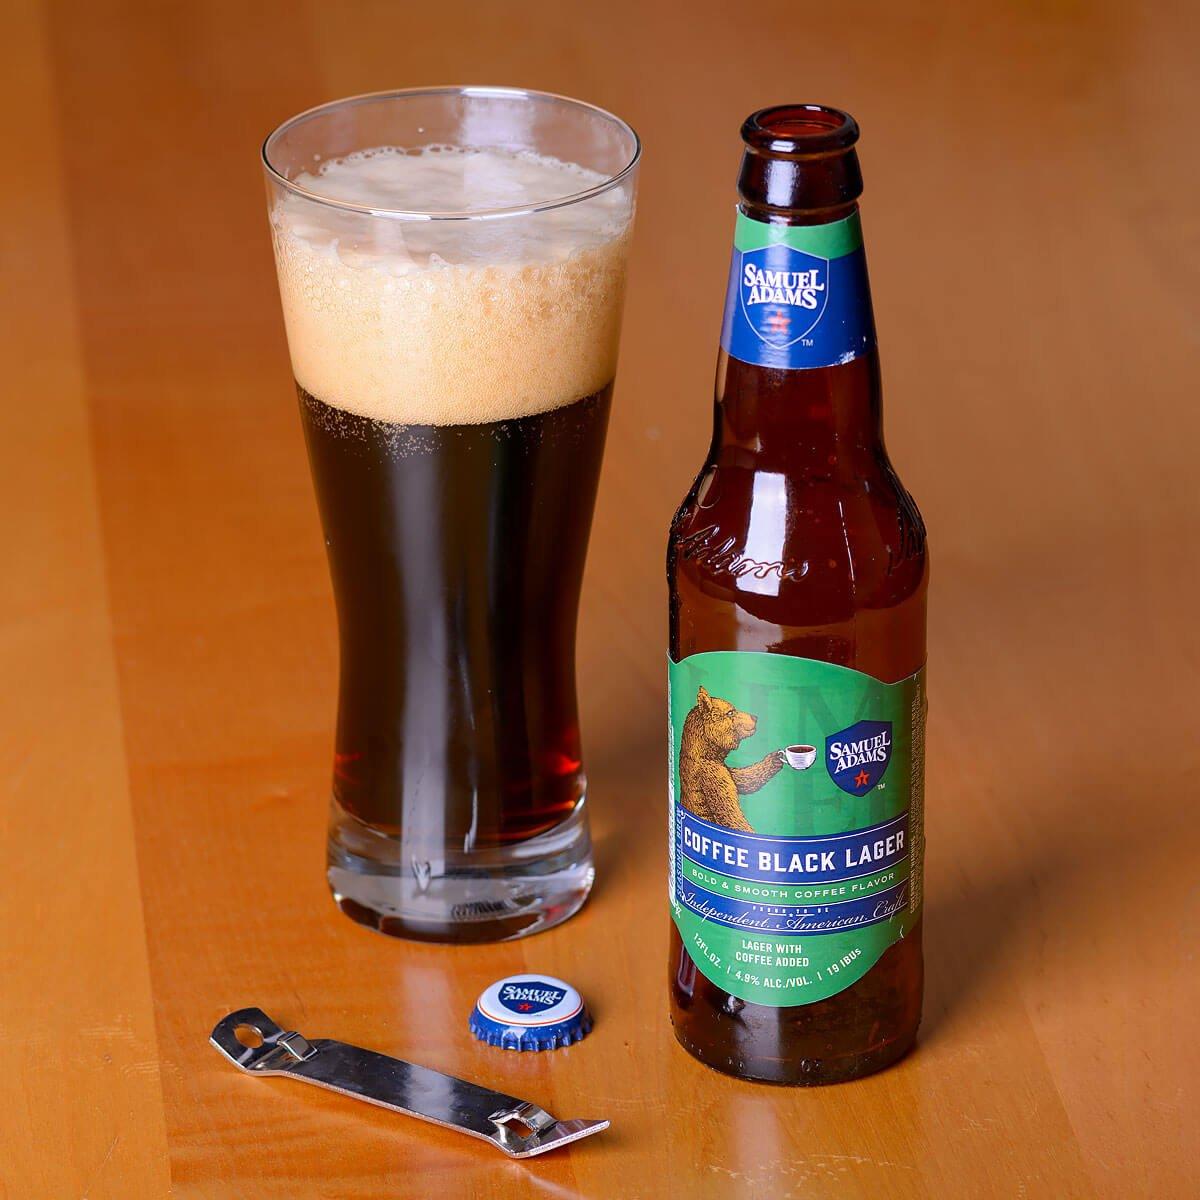 Samuel Adams Coffee Black Lager, a German-style Schwarzbier brewed by the Boston Beer Company